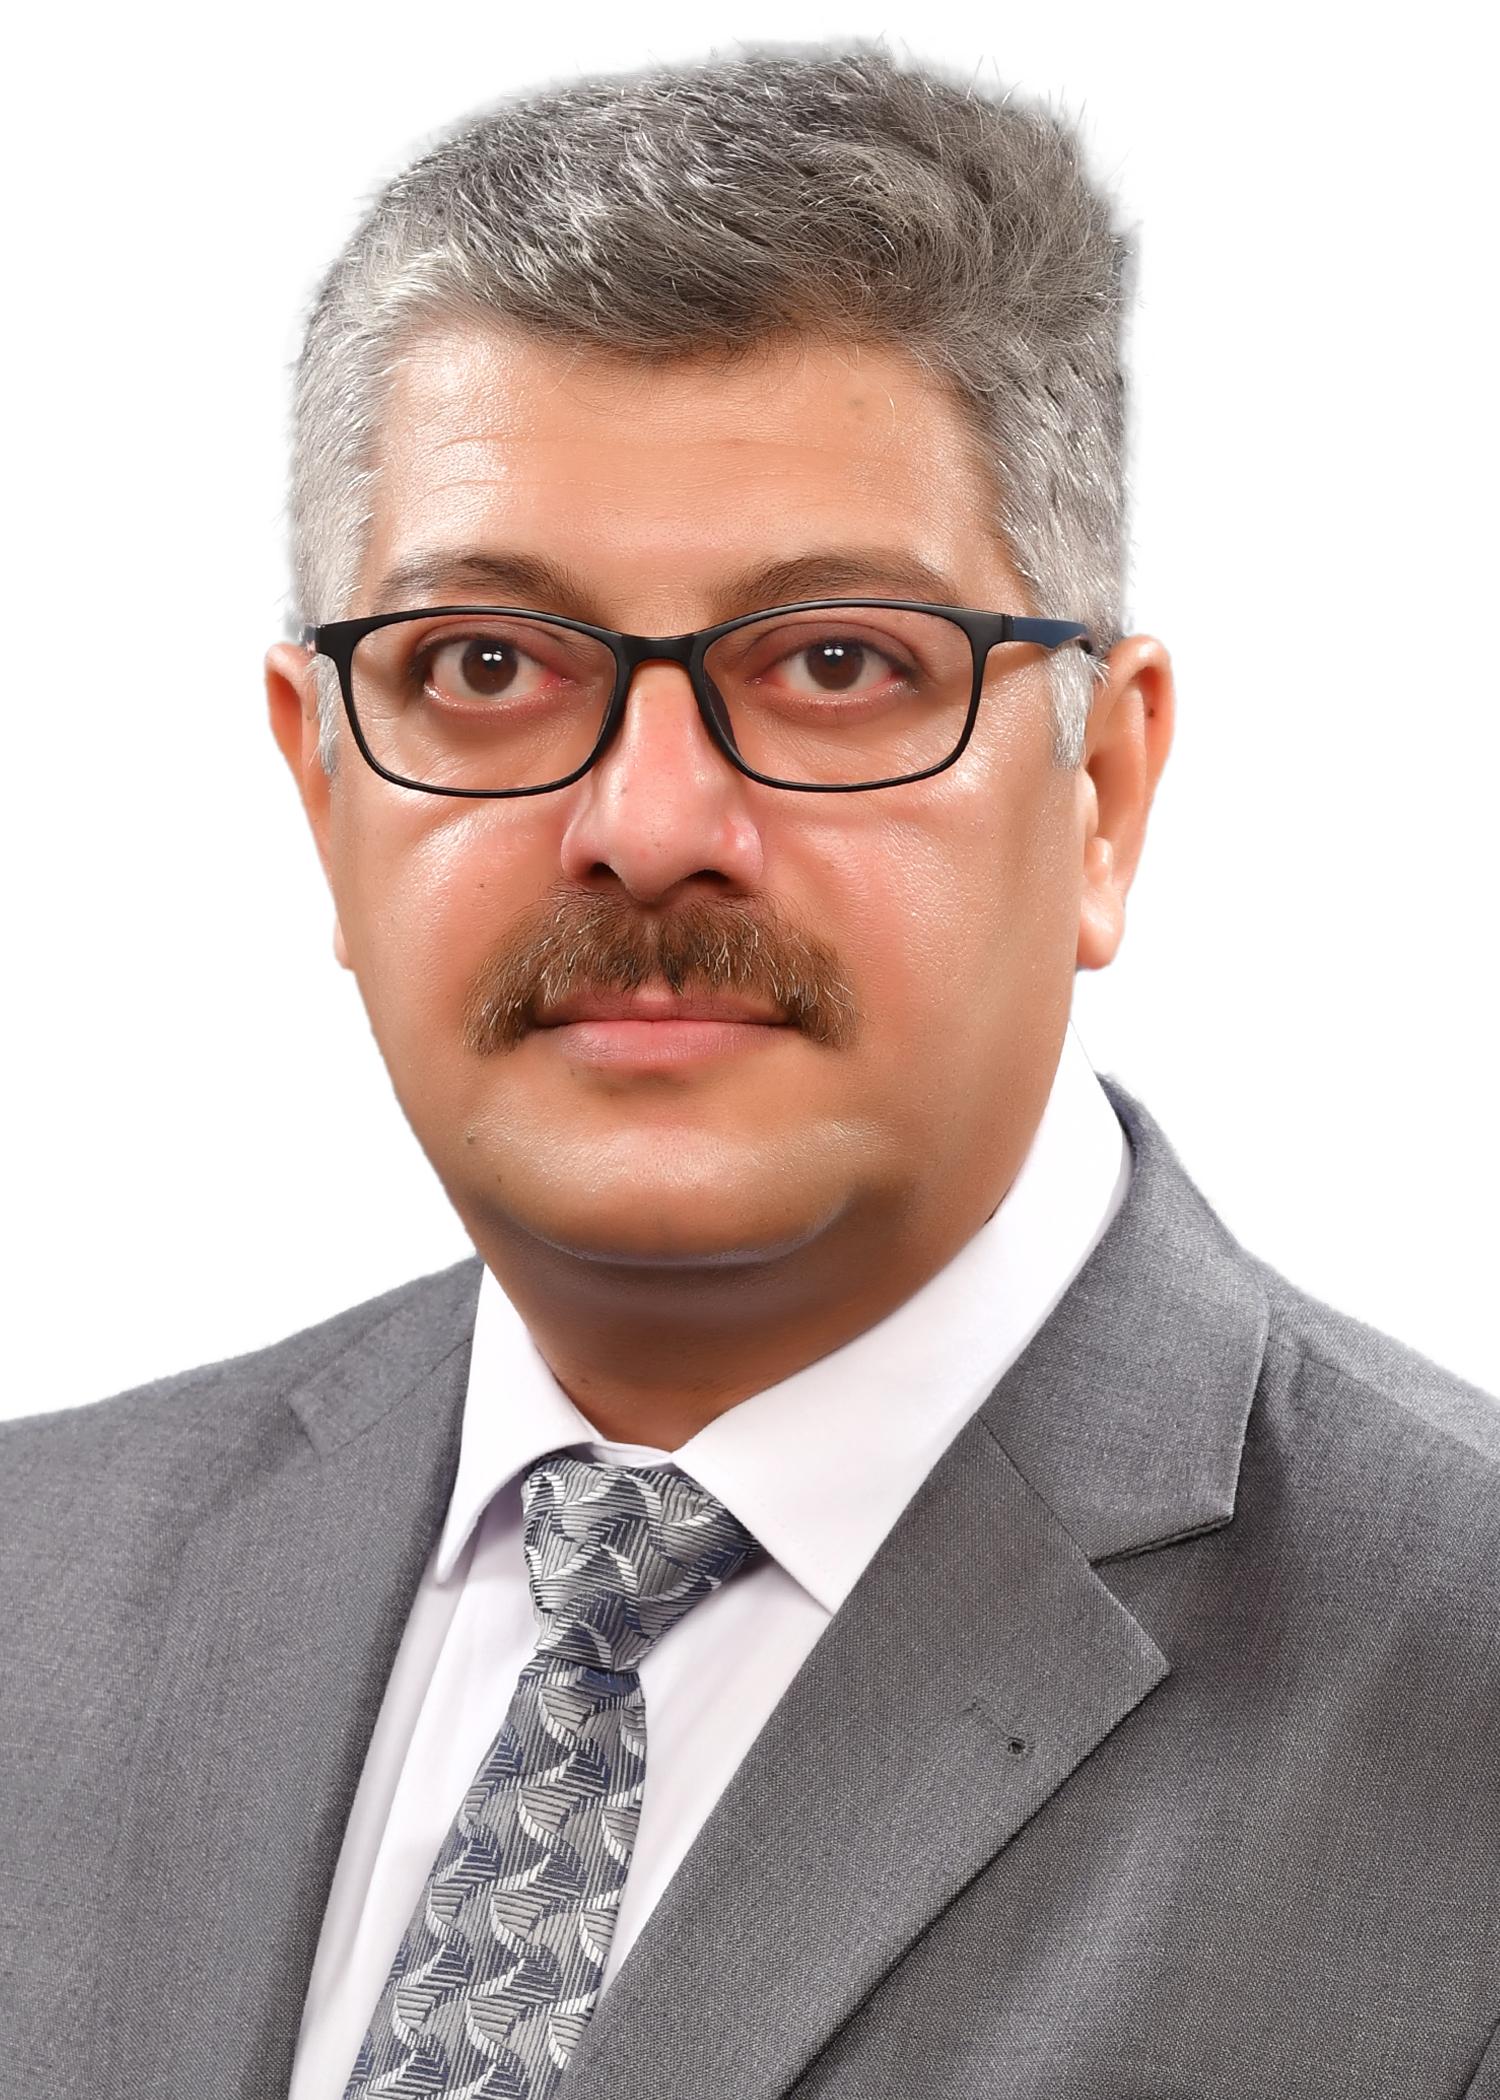 HAZIM SAAD JABBAR AL-MALIKI